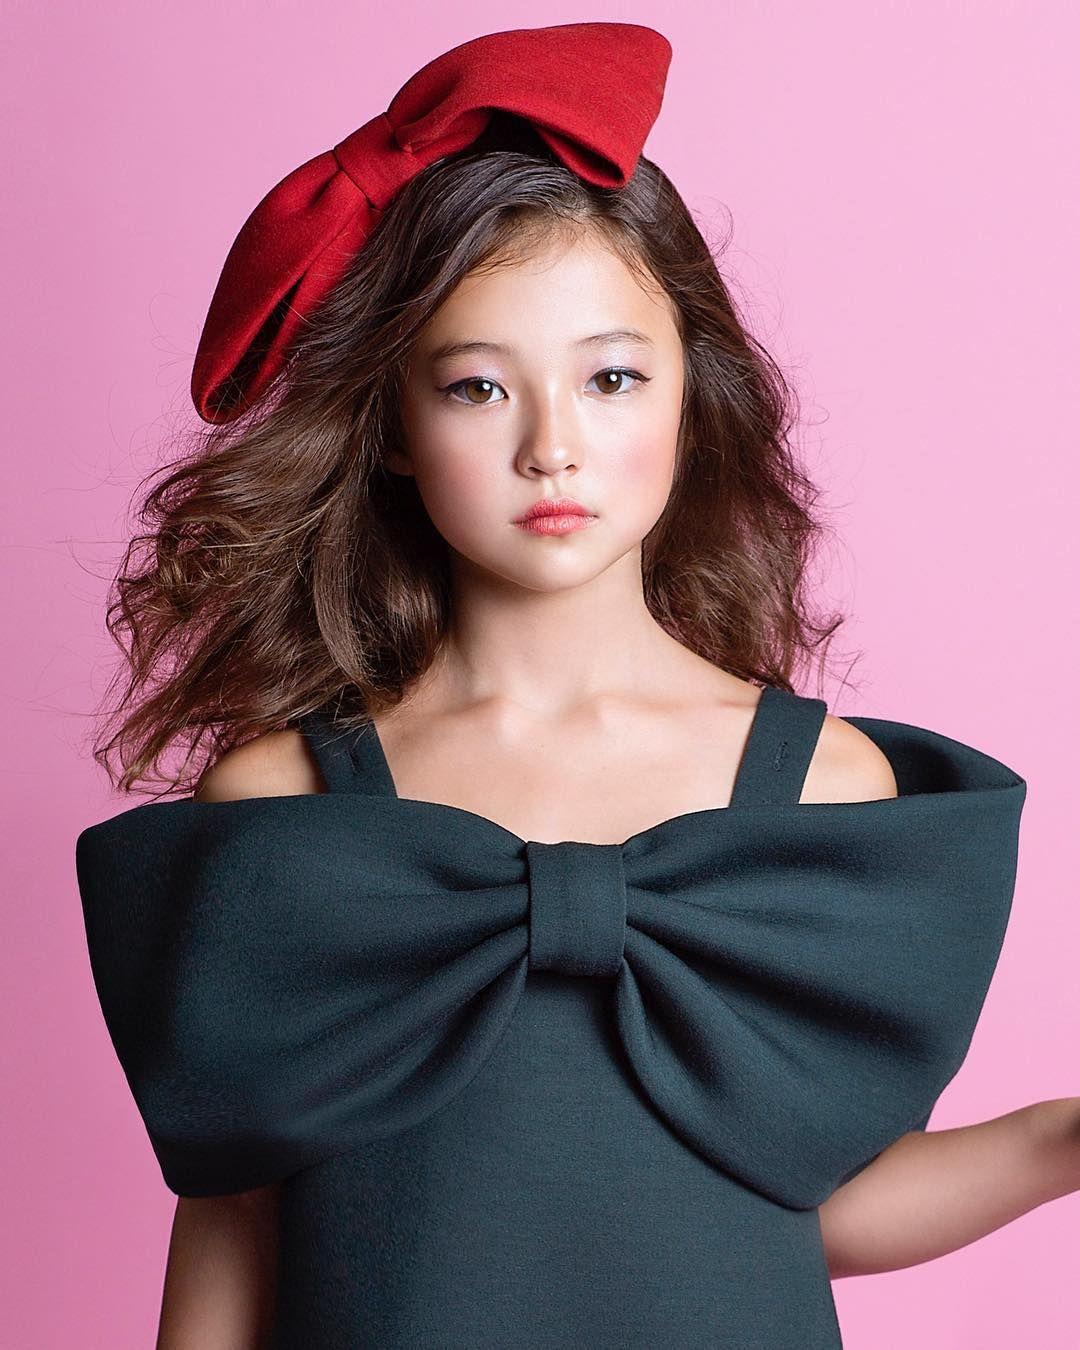 Pin de Елена en Детский fashion | Pinterest | Moda niños y Blusas